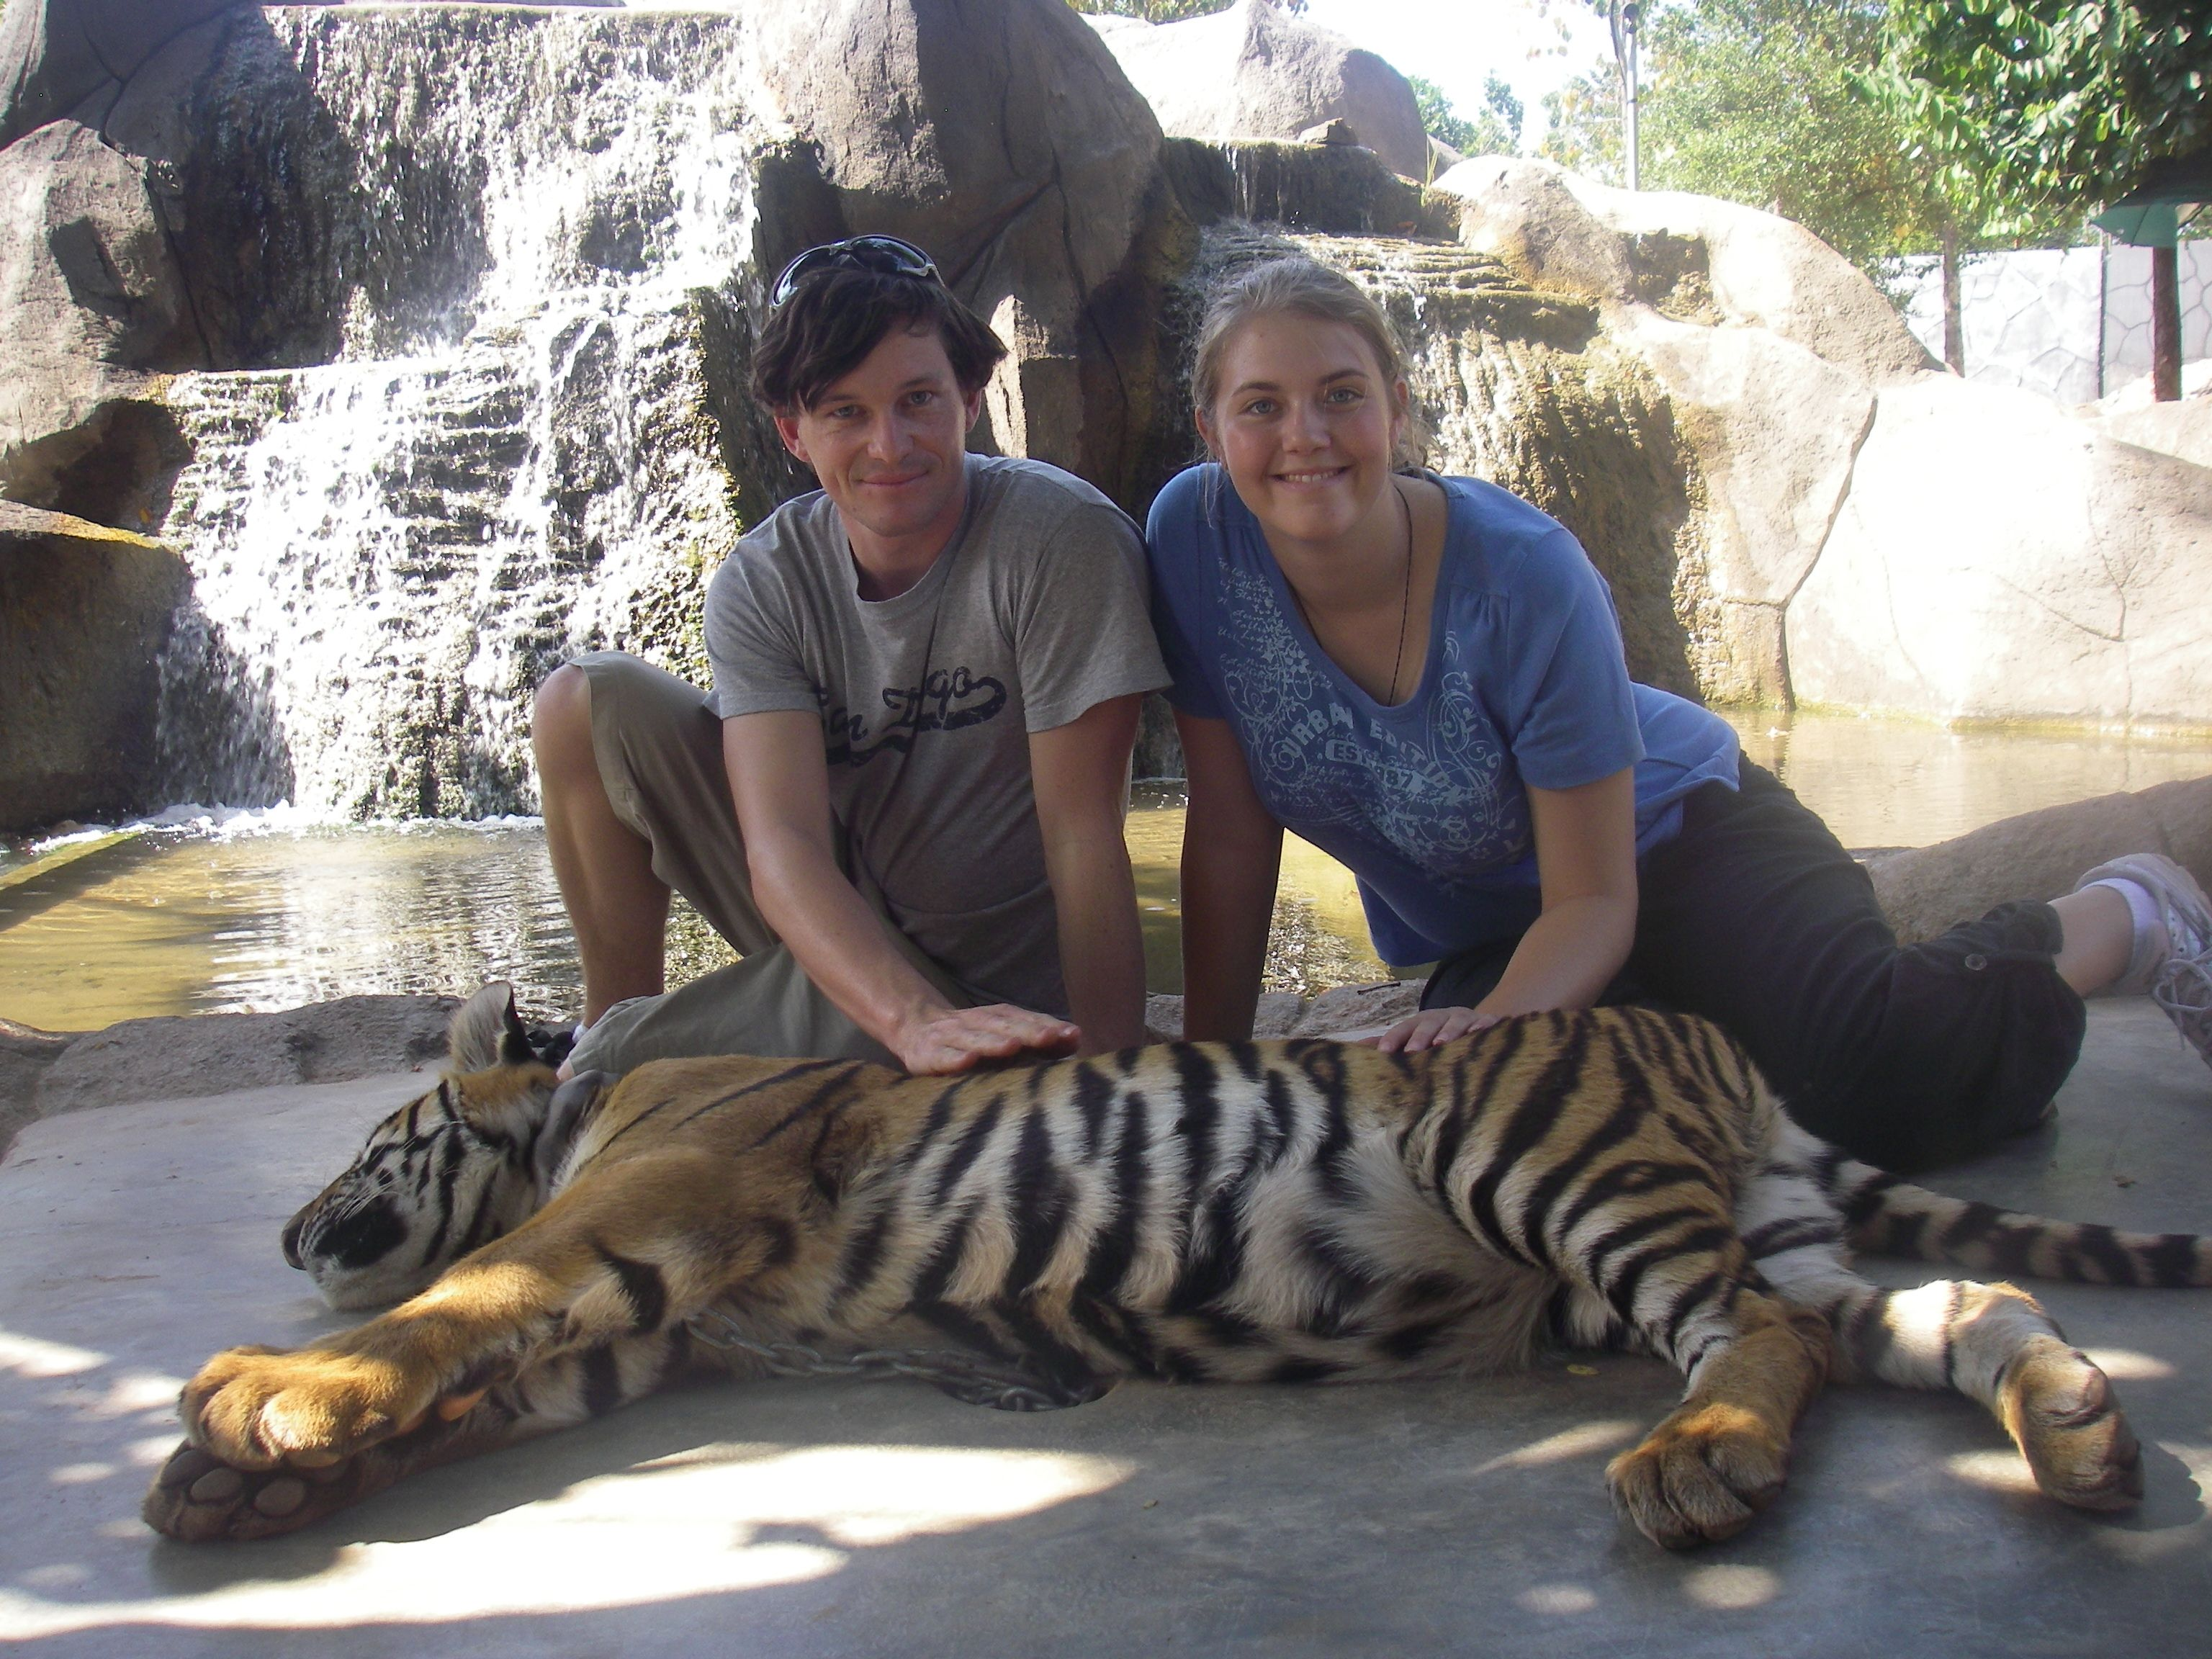 Reincarnated (Doped up) Tigers near Bangkok